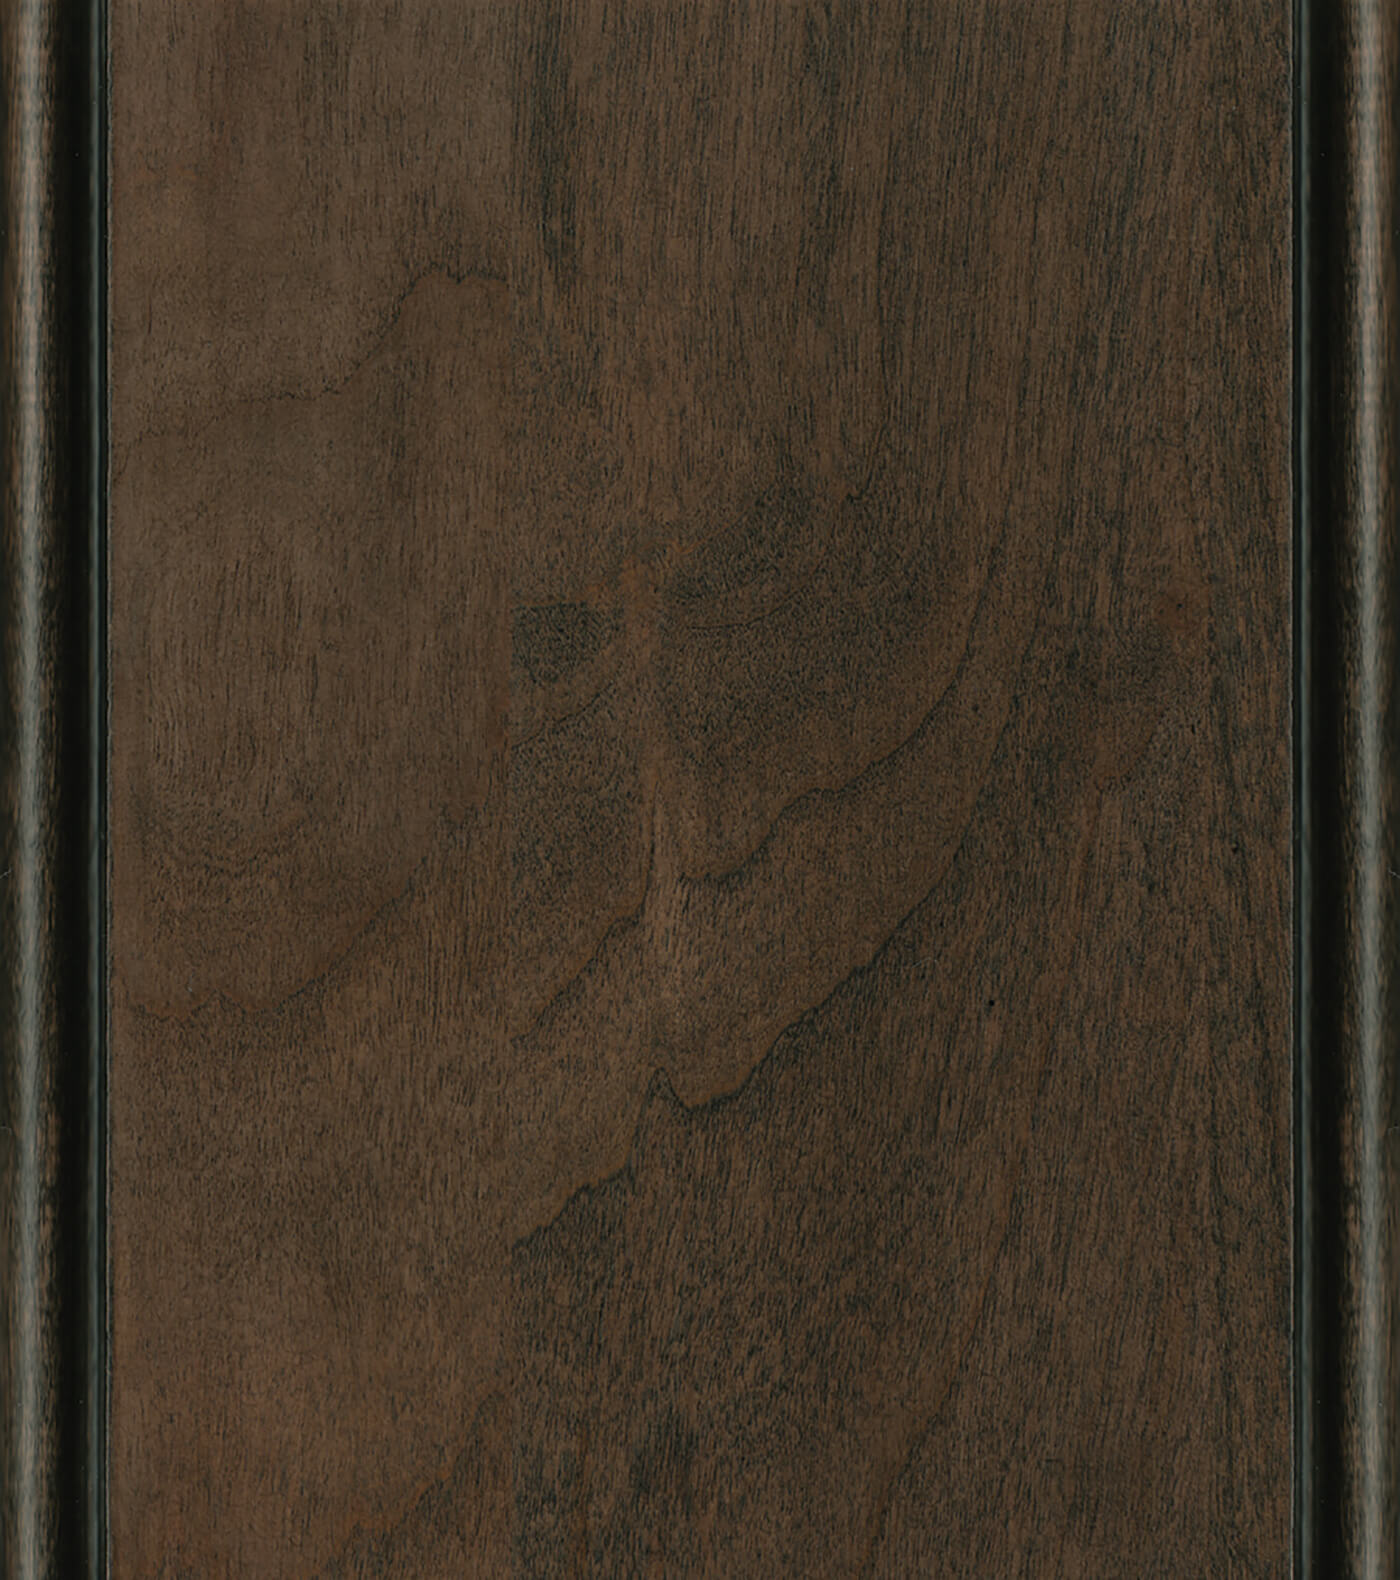 Morel / Charcoal Glaze Stain/Glaze on Cherry